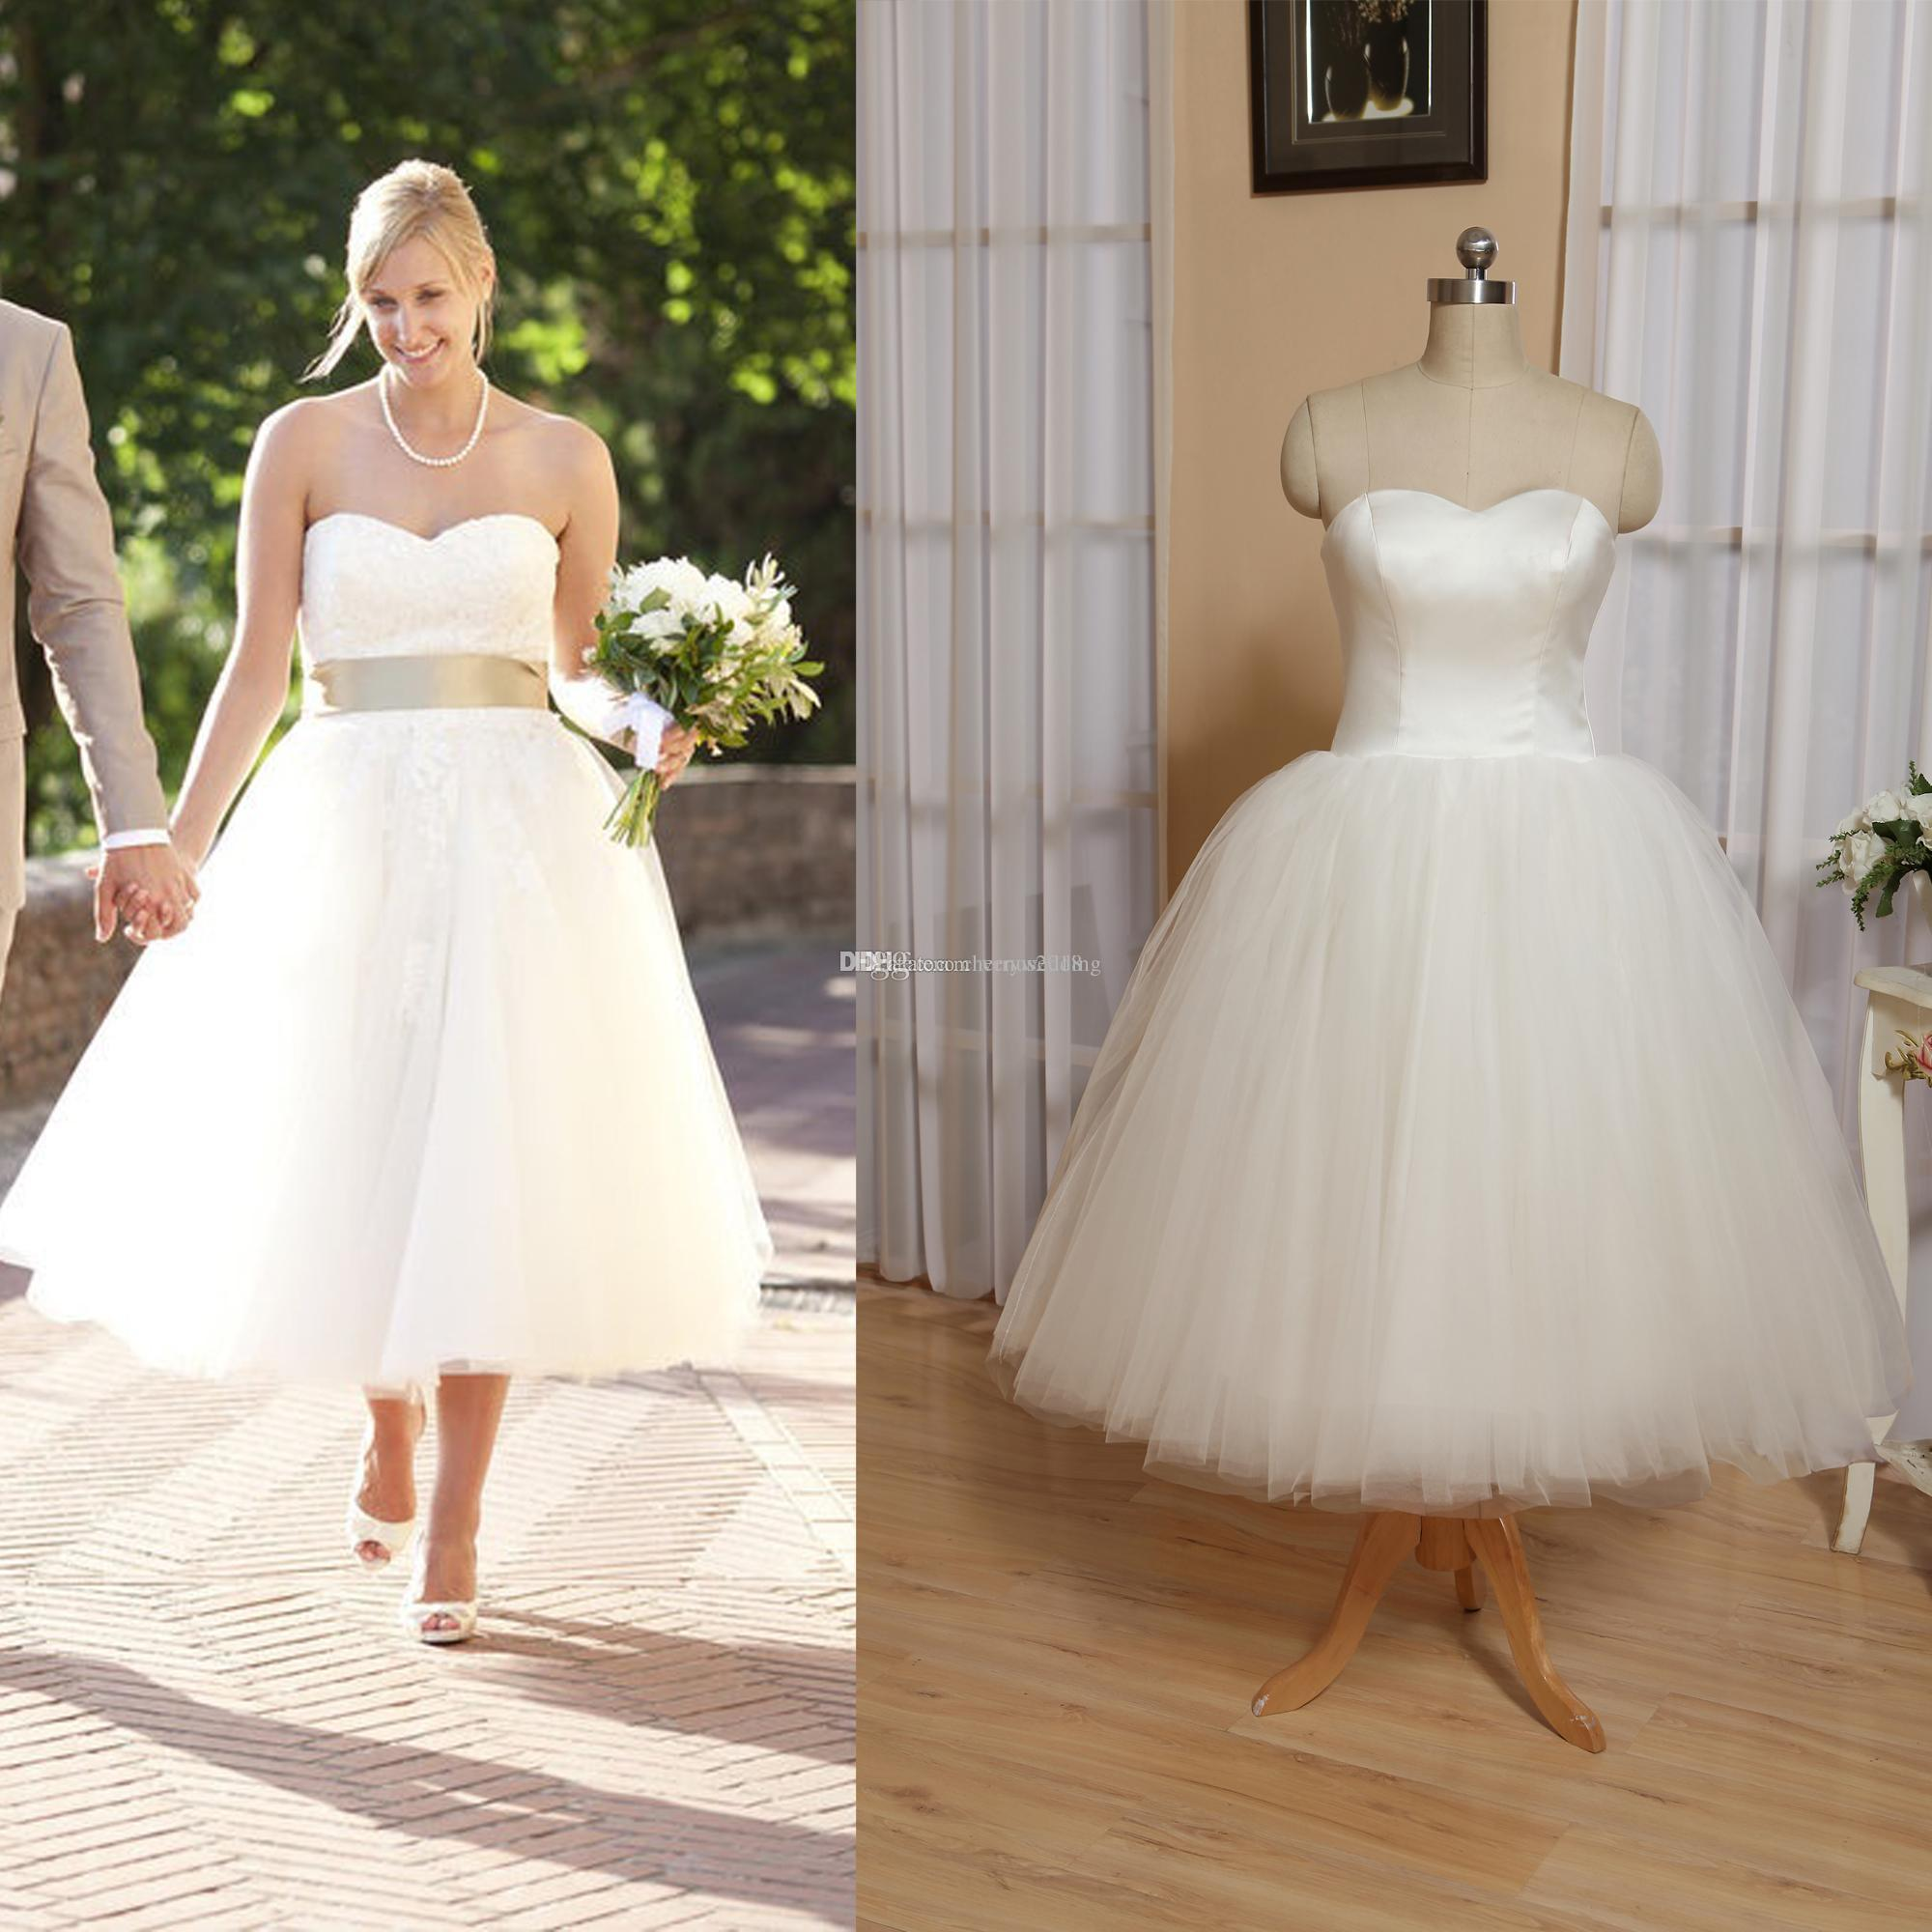 2021 Short Wedding Dress Tulle Skirt Satin Bodice vintage Knee Length Wedding Dresses plus size wedding dresses